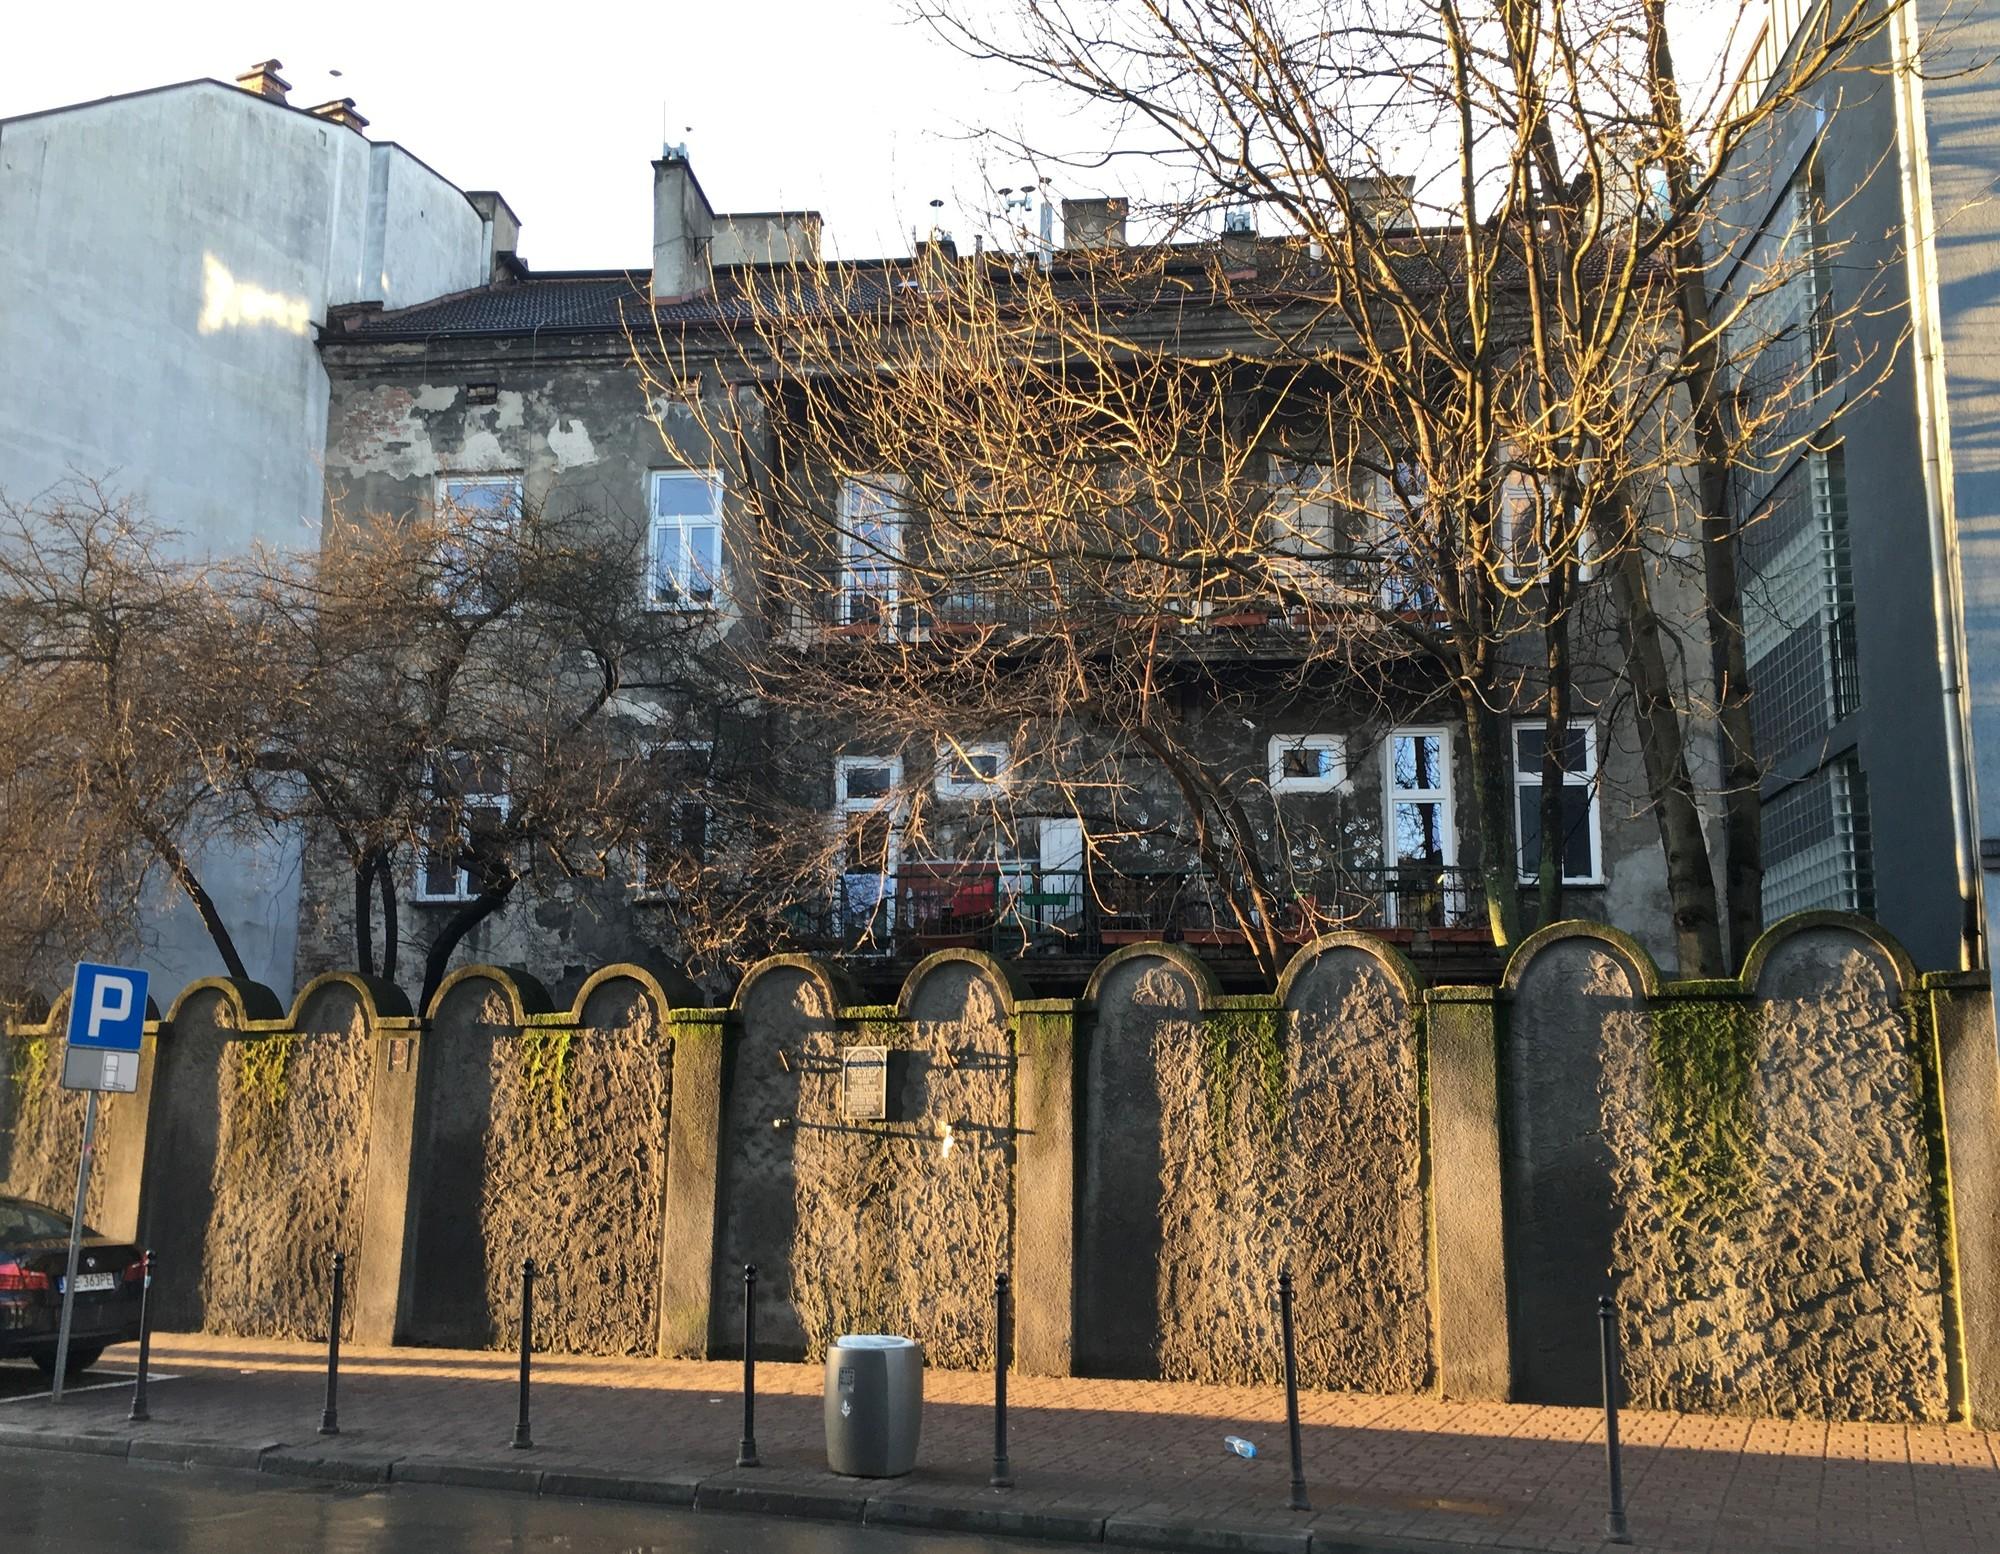 ghetto wall fragment kraków sightseeing krakow